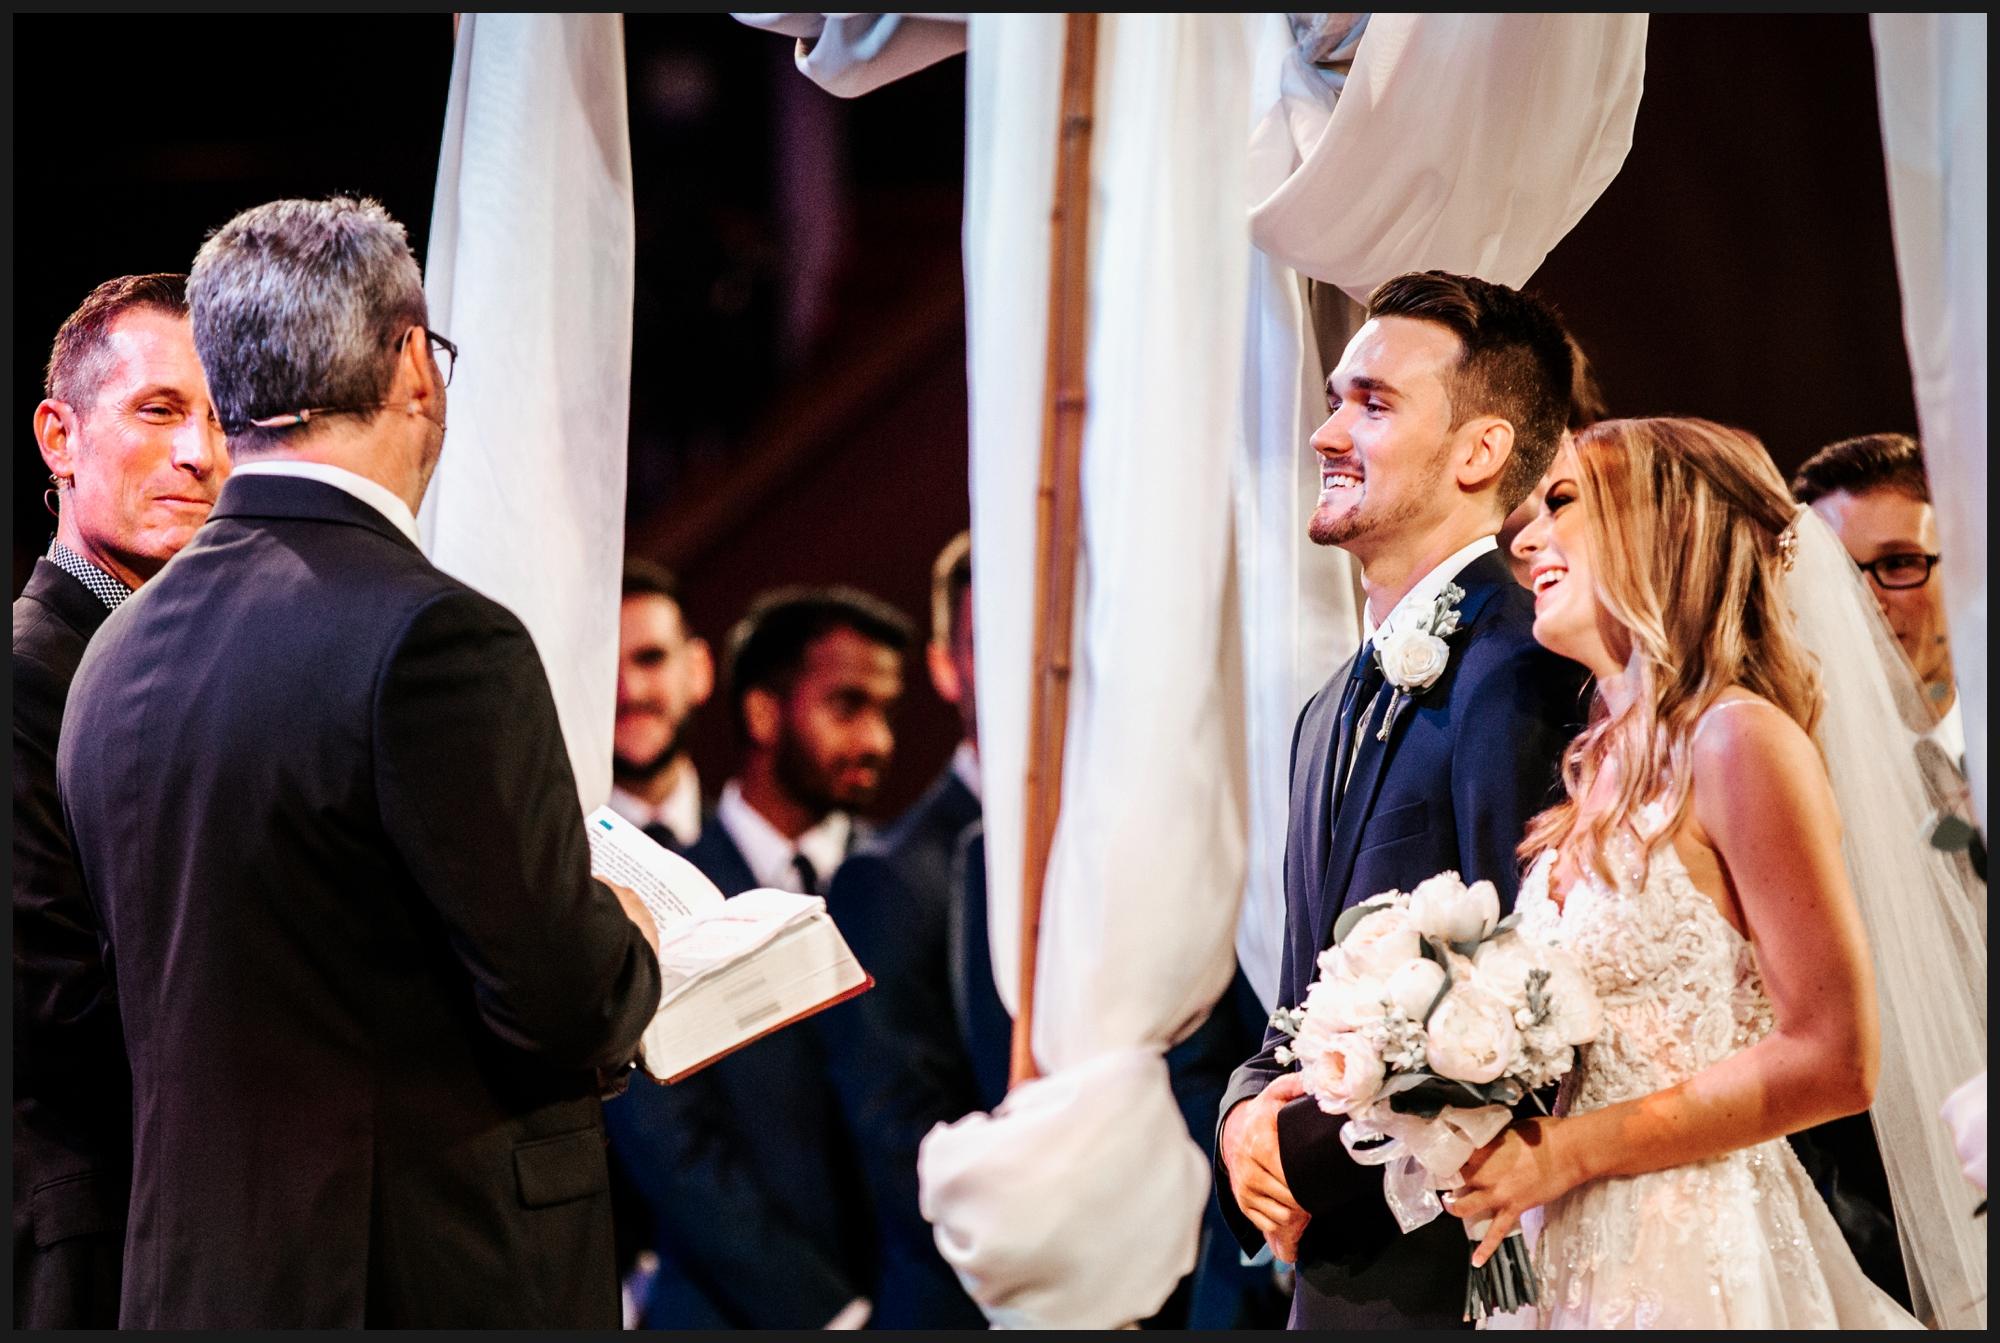 Orlando-Wedding-Photographer-destination-wedding-photographer-florida-wedding-photographer-bohemian-wedding-photographer_0081.jpg